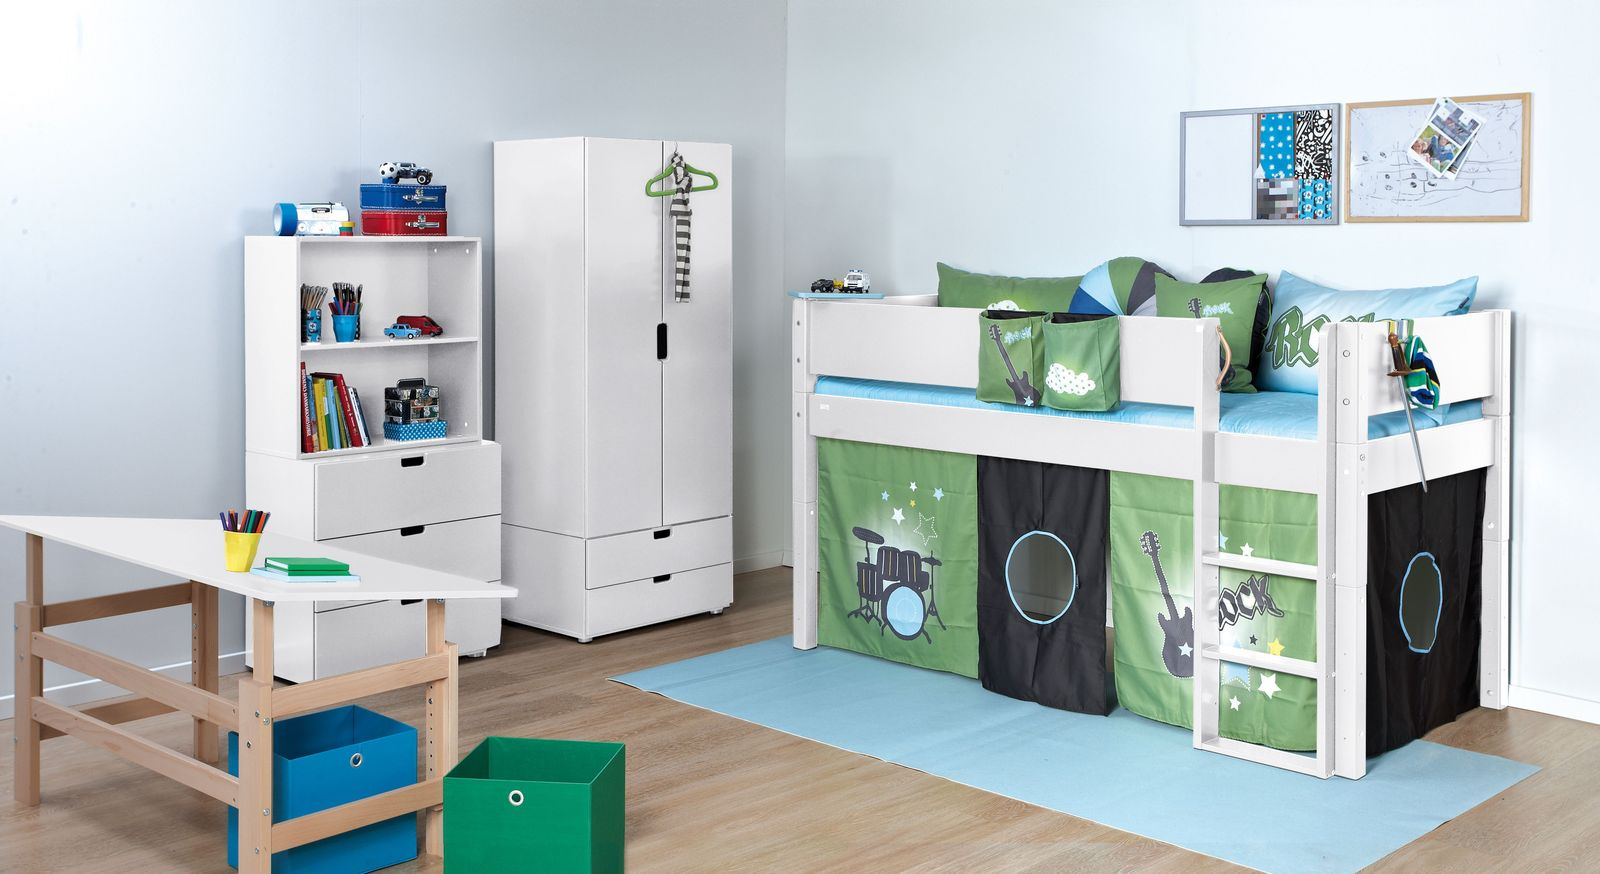 Passende Produkte zum Mini-Hochbett Kids Town